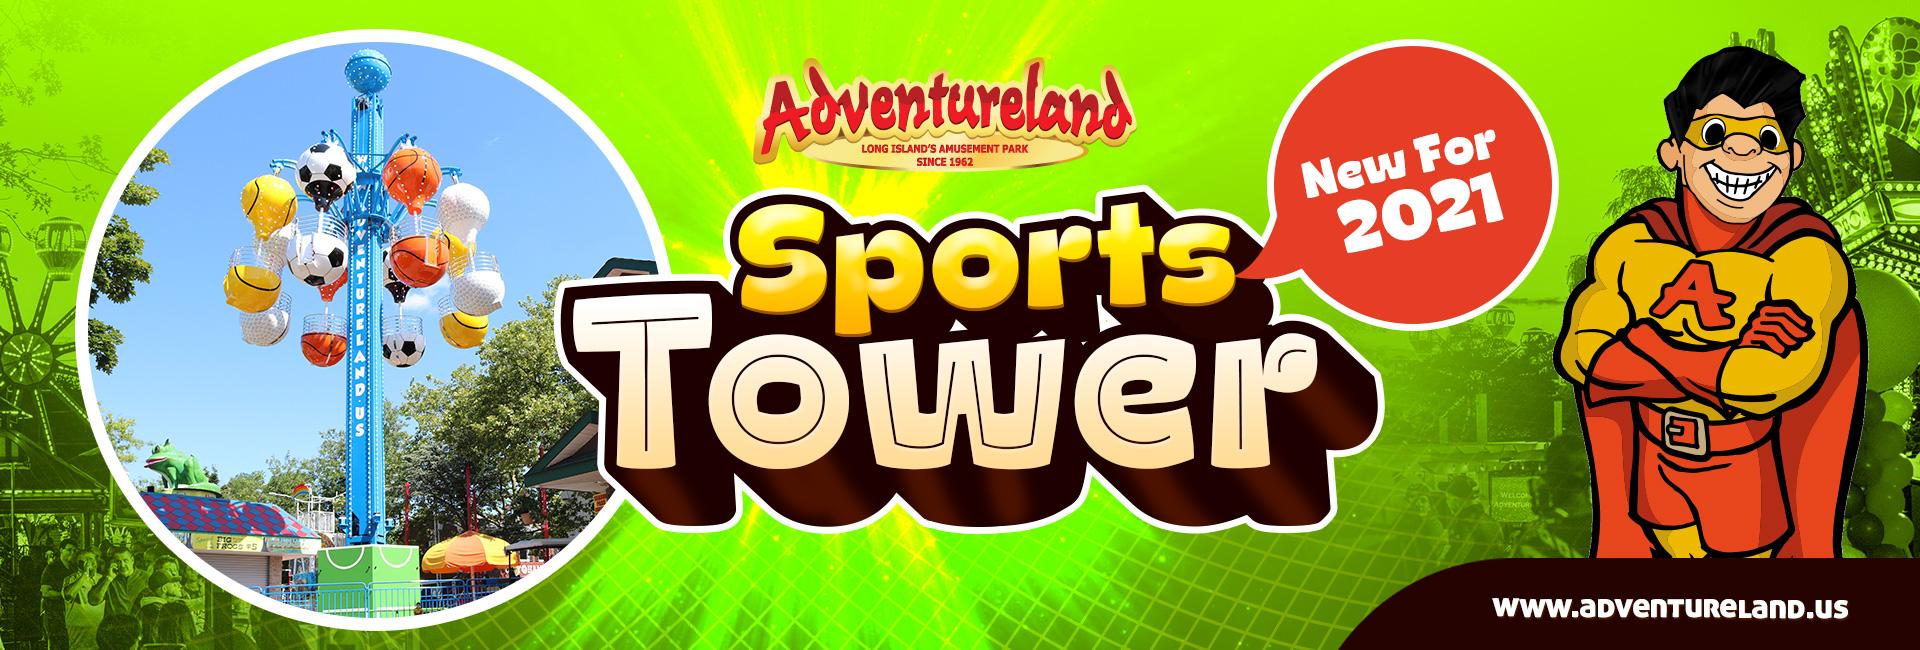 Adventureland Amusement Park Long Island New York